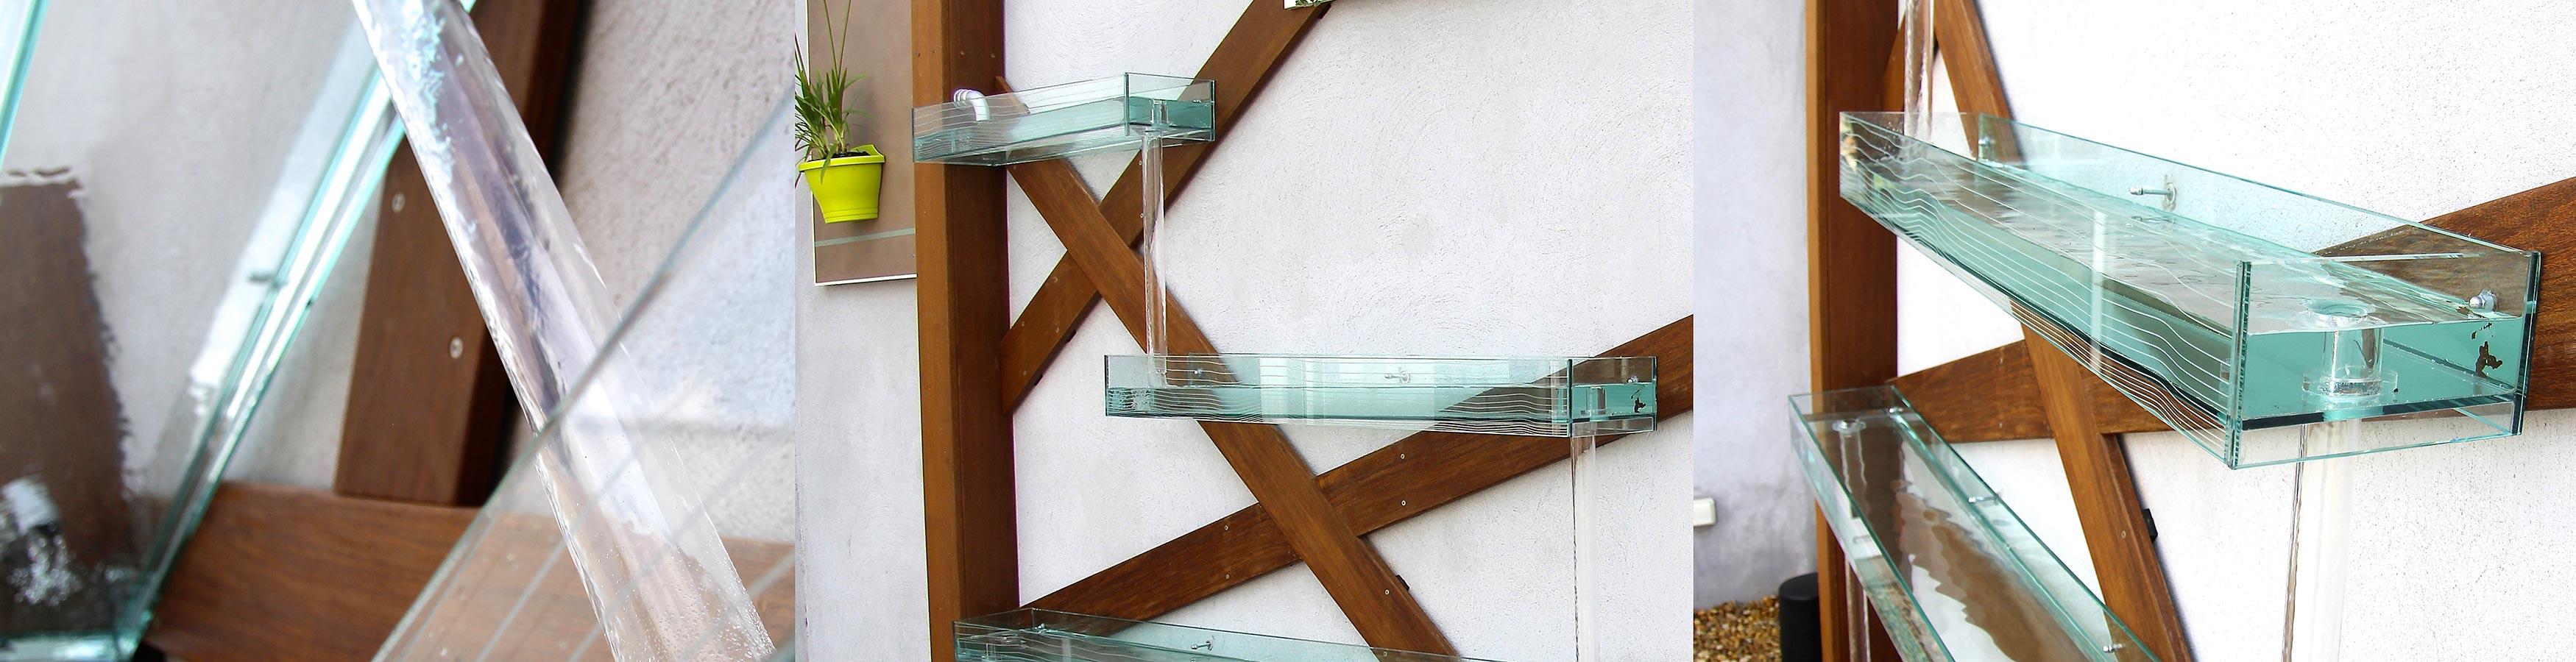 Rivière en verre murale